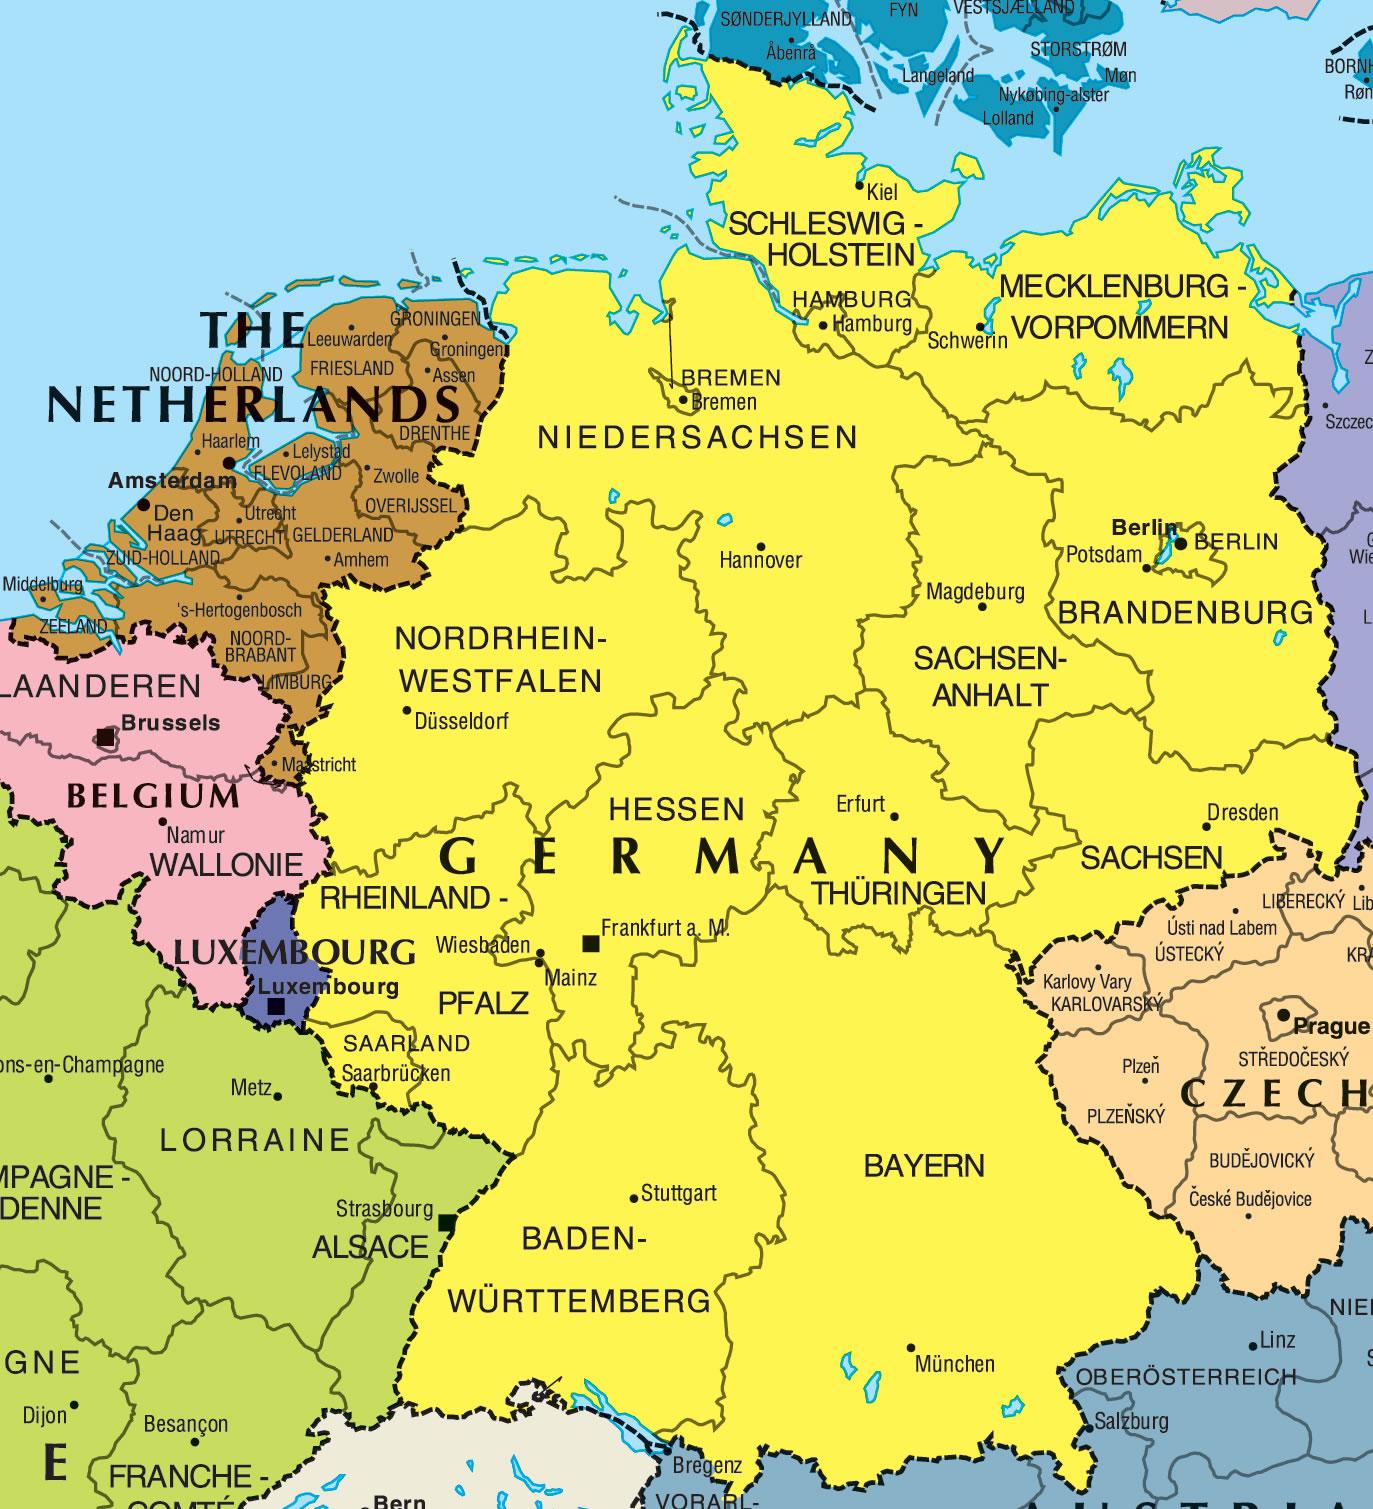 Carte Du Monde Allemagne.Carte Frontieres Allemagne Carte Des Frontieres De L Allemagne